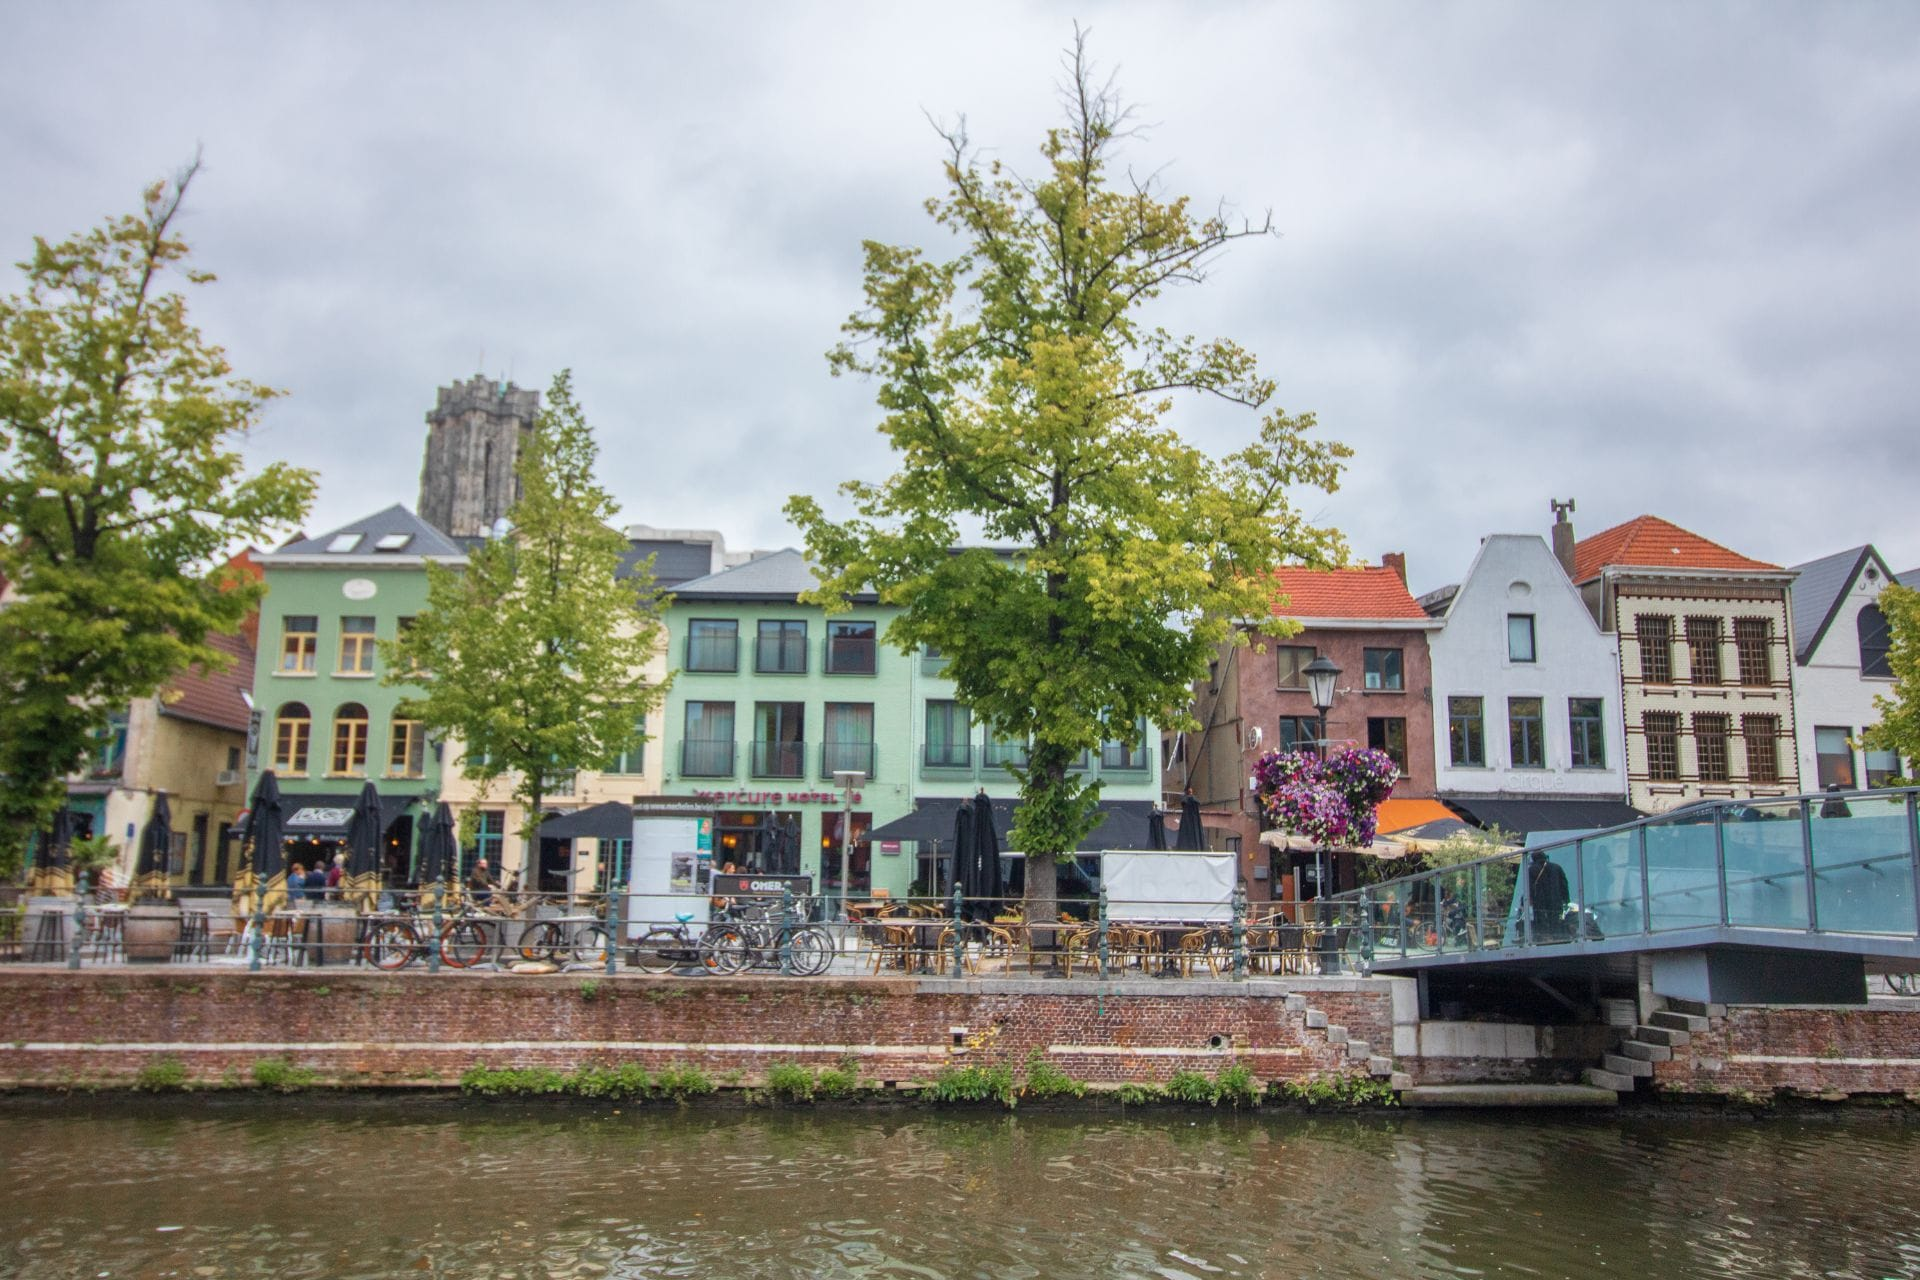 colourful-buildings-housing-restaurants-and-bars-along-the-river-with-a-bridge-crossing-it-vismarkt-mechelen-belgium